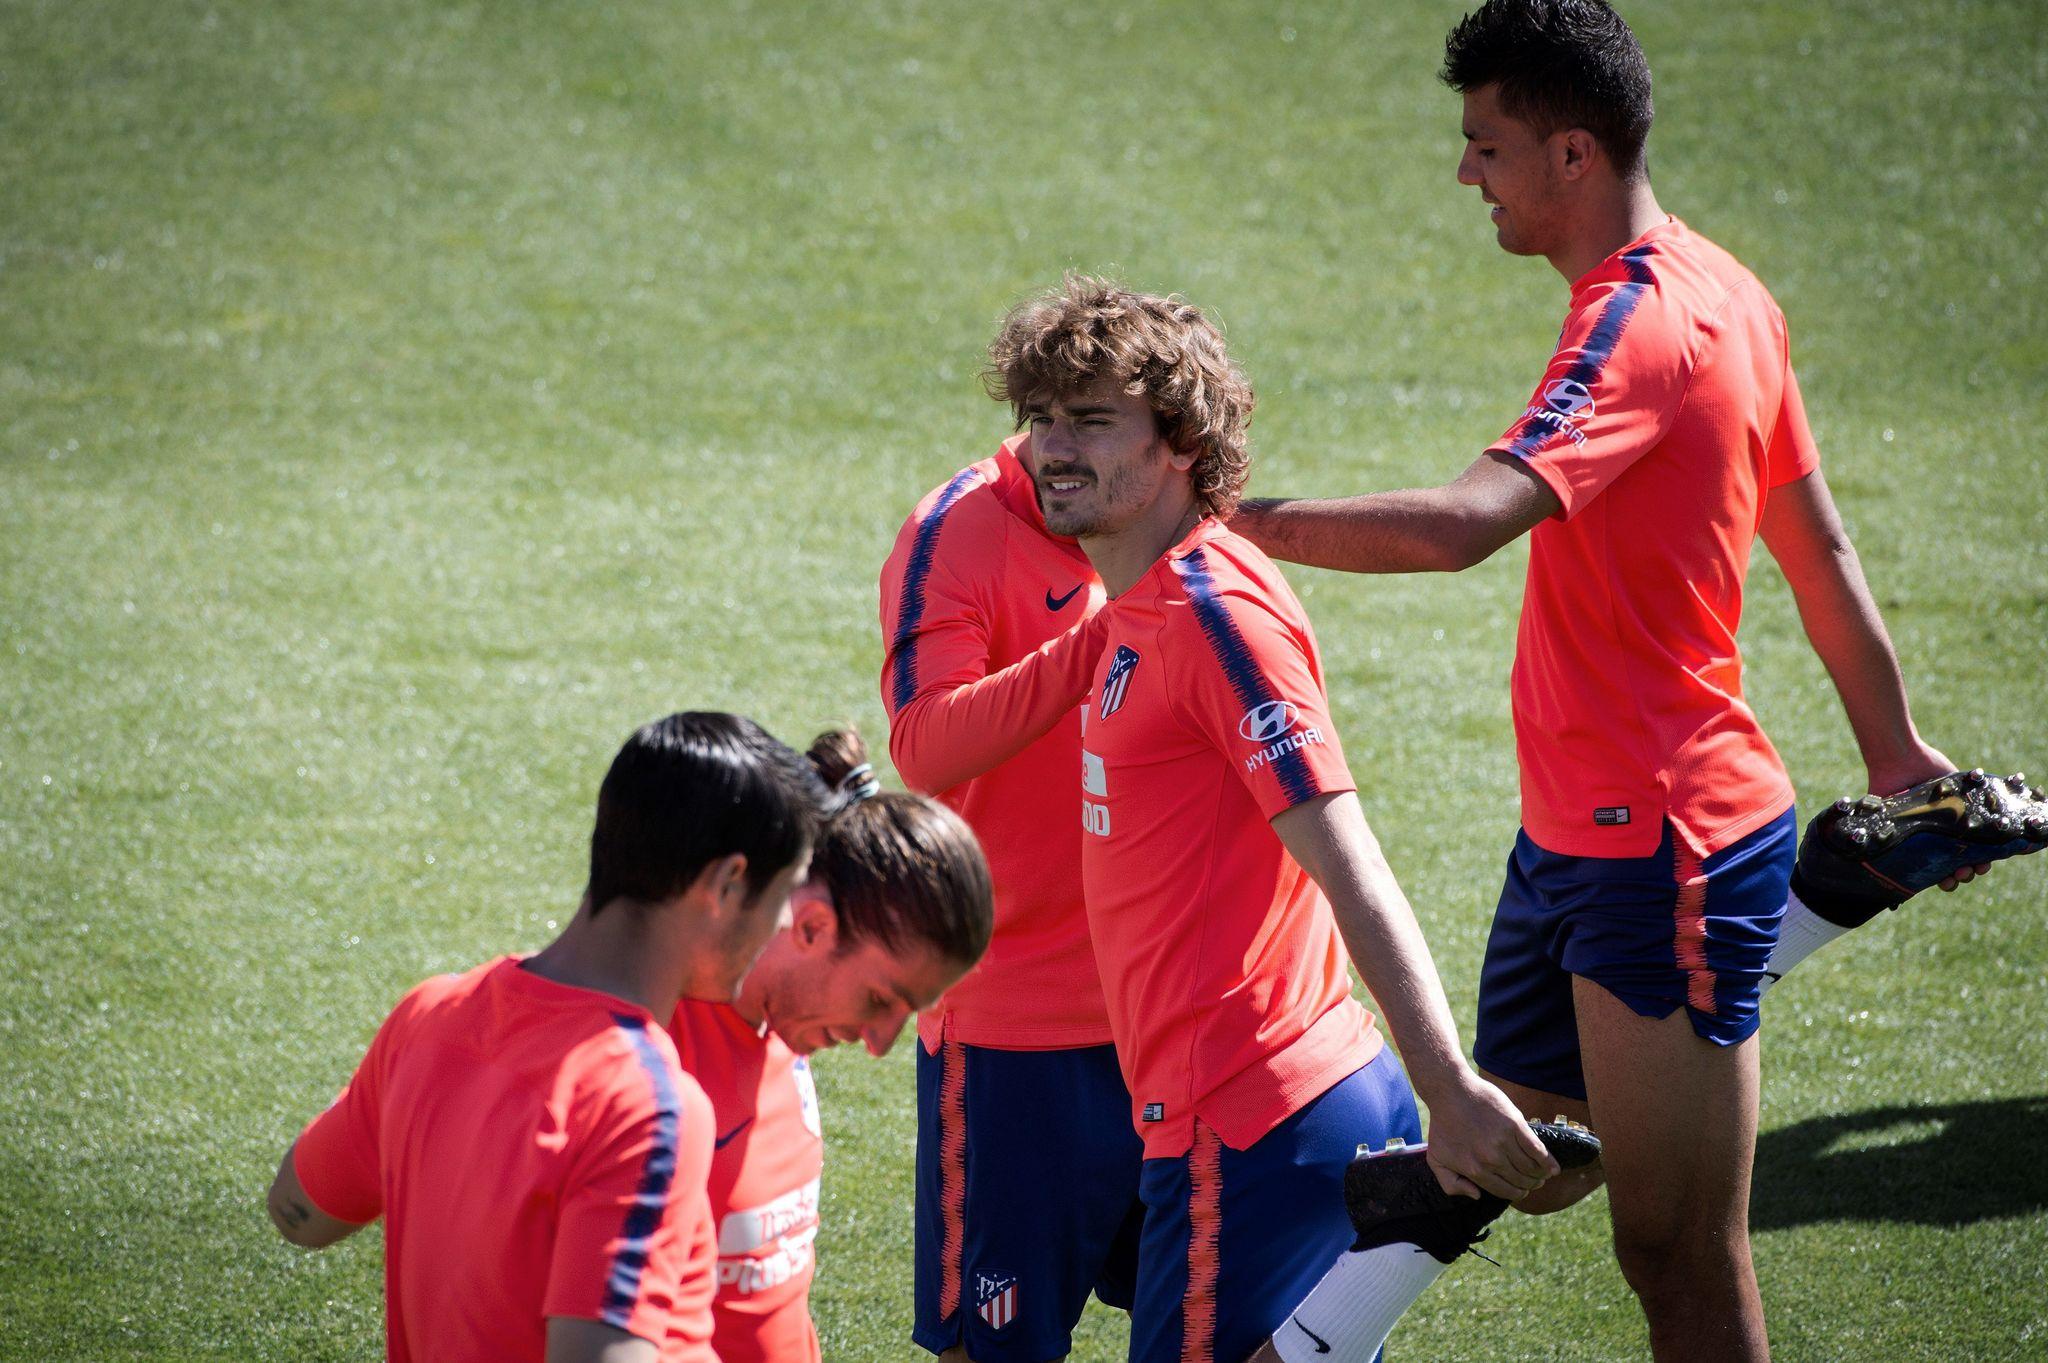 GRAF8489. MAJADAHONDA (MADRID).- El delantero francés del Atlético...